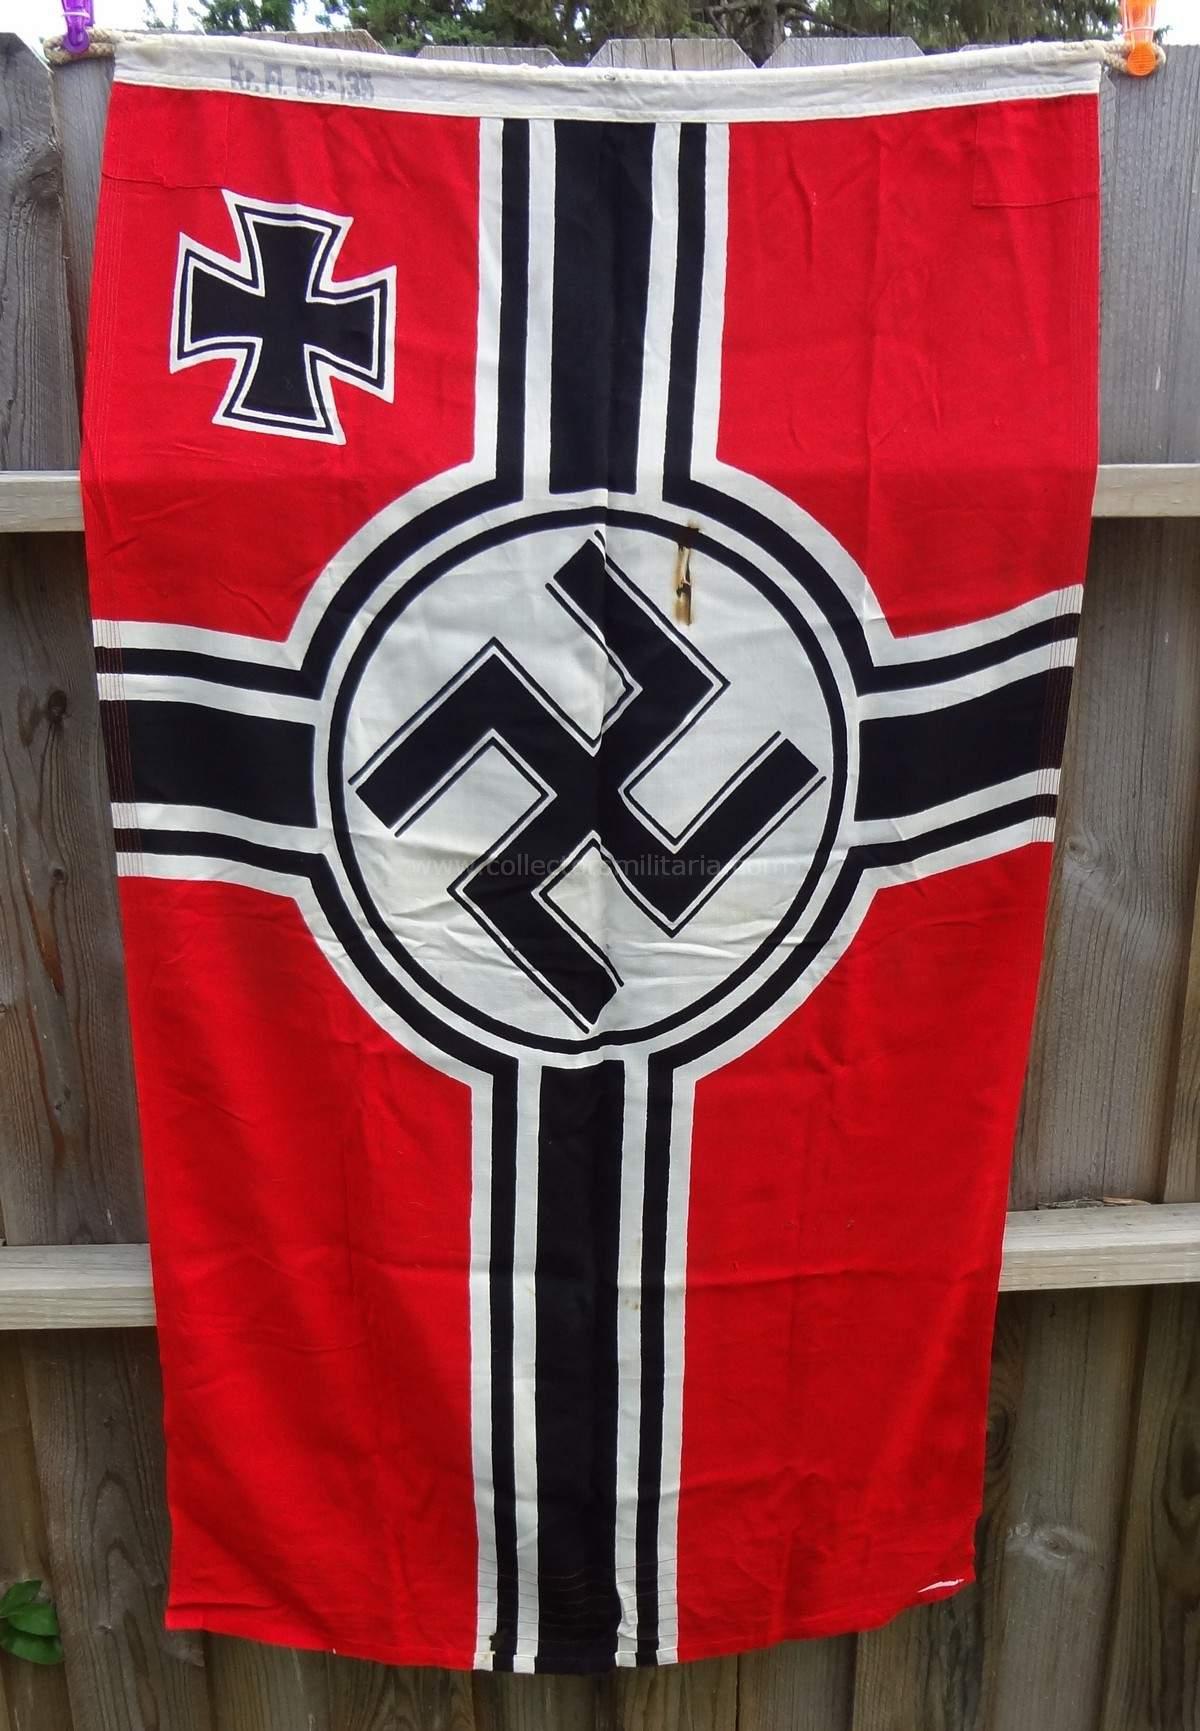 Images of Ww2 Nazi Memorabilia - #rock-cafe